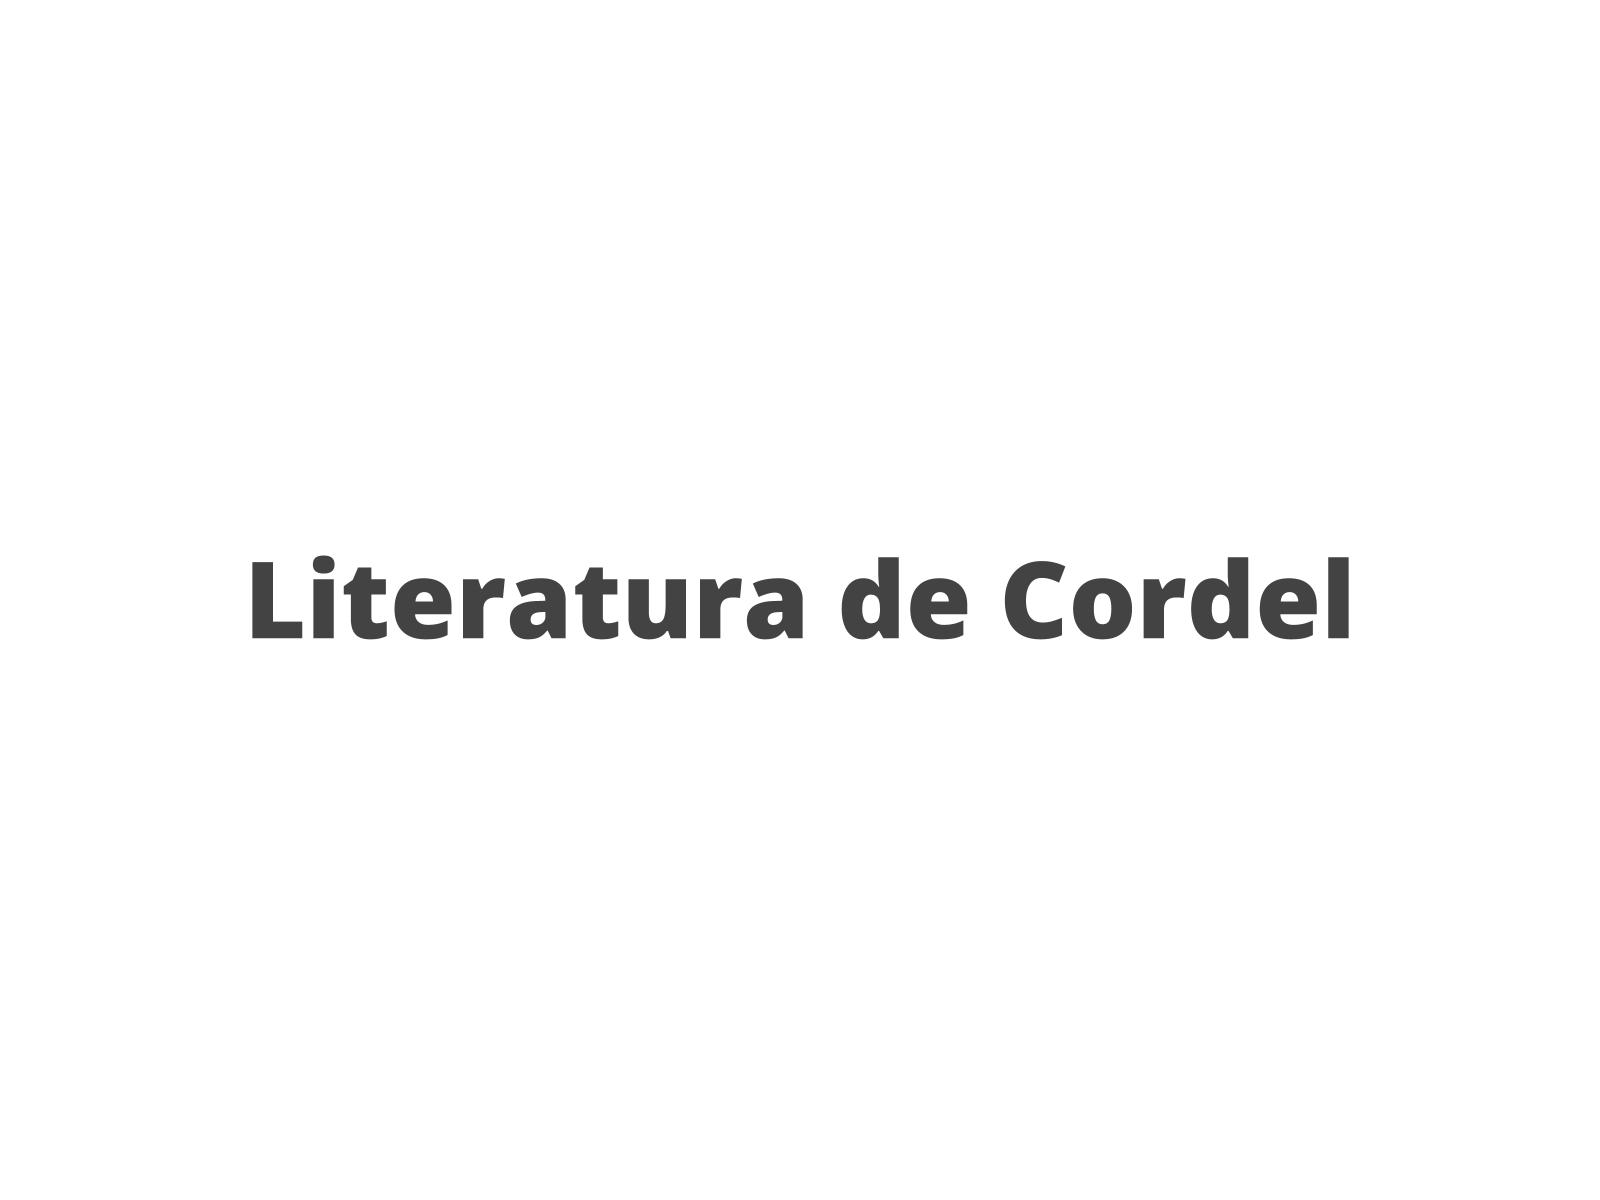 Literatura de Cordel: Valores culturais e identidade regional